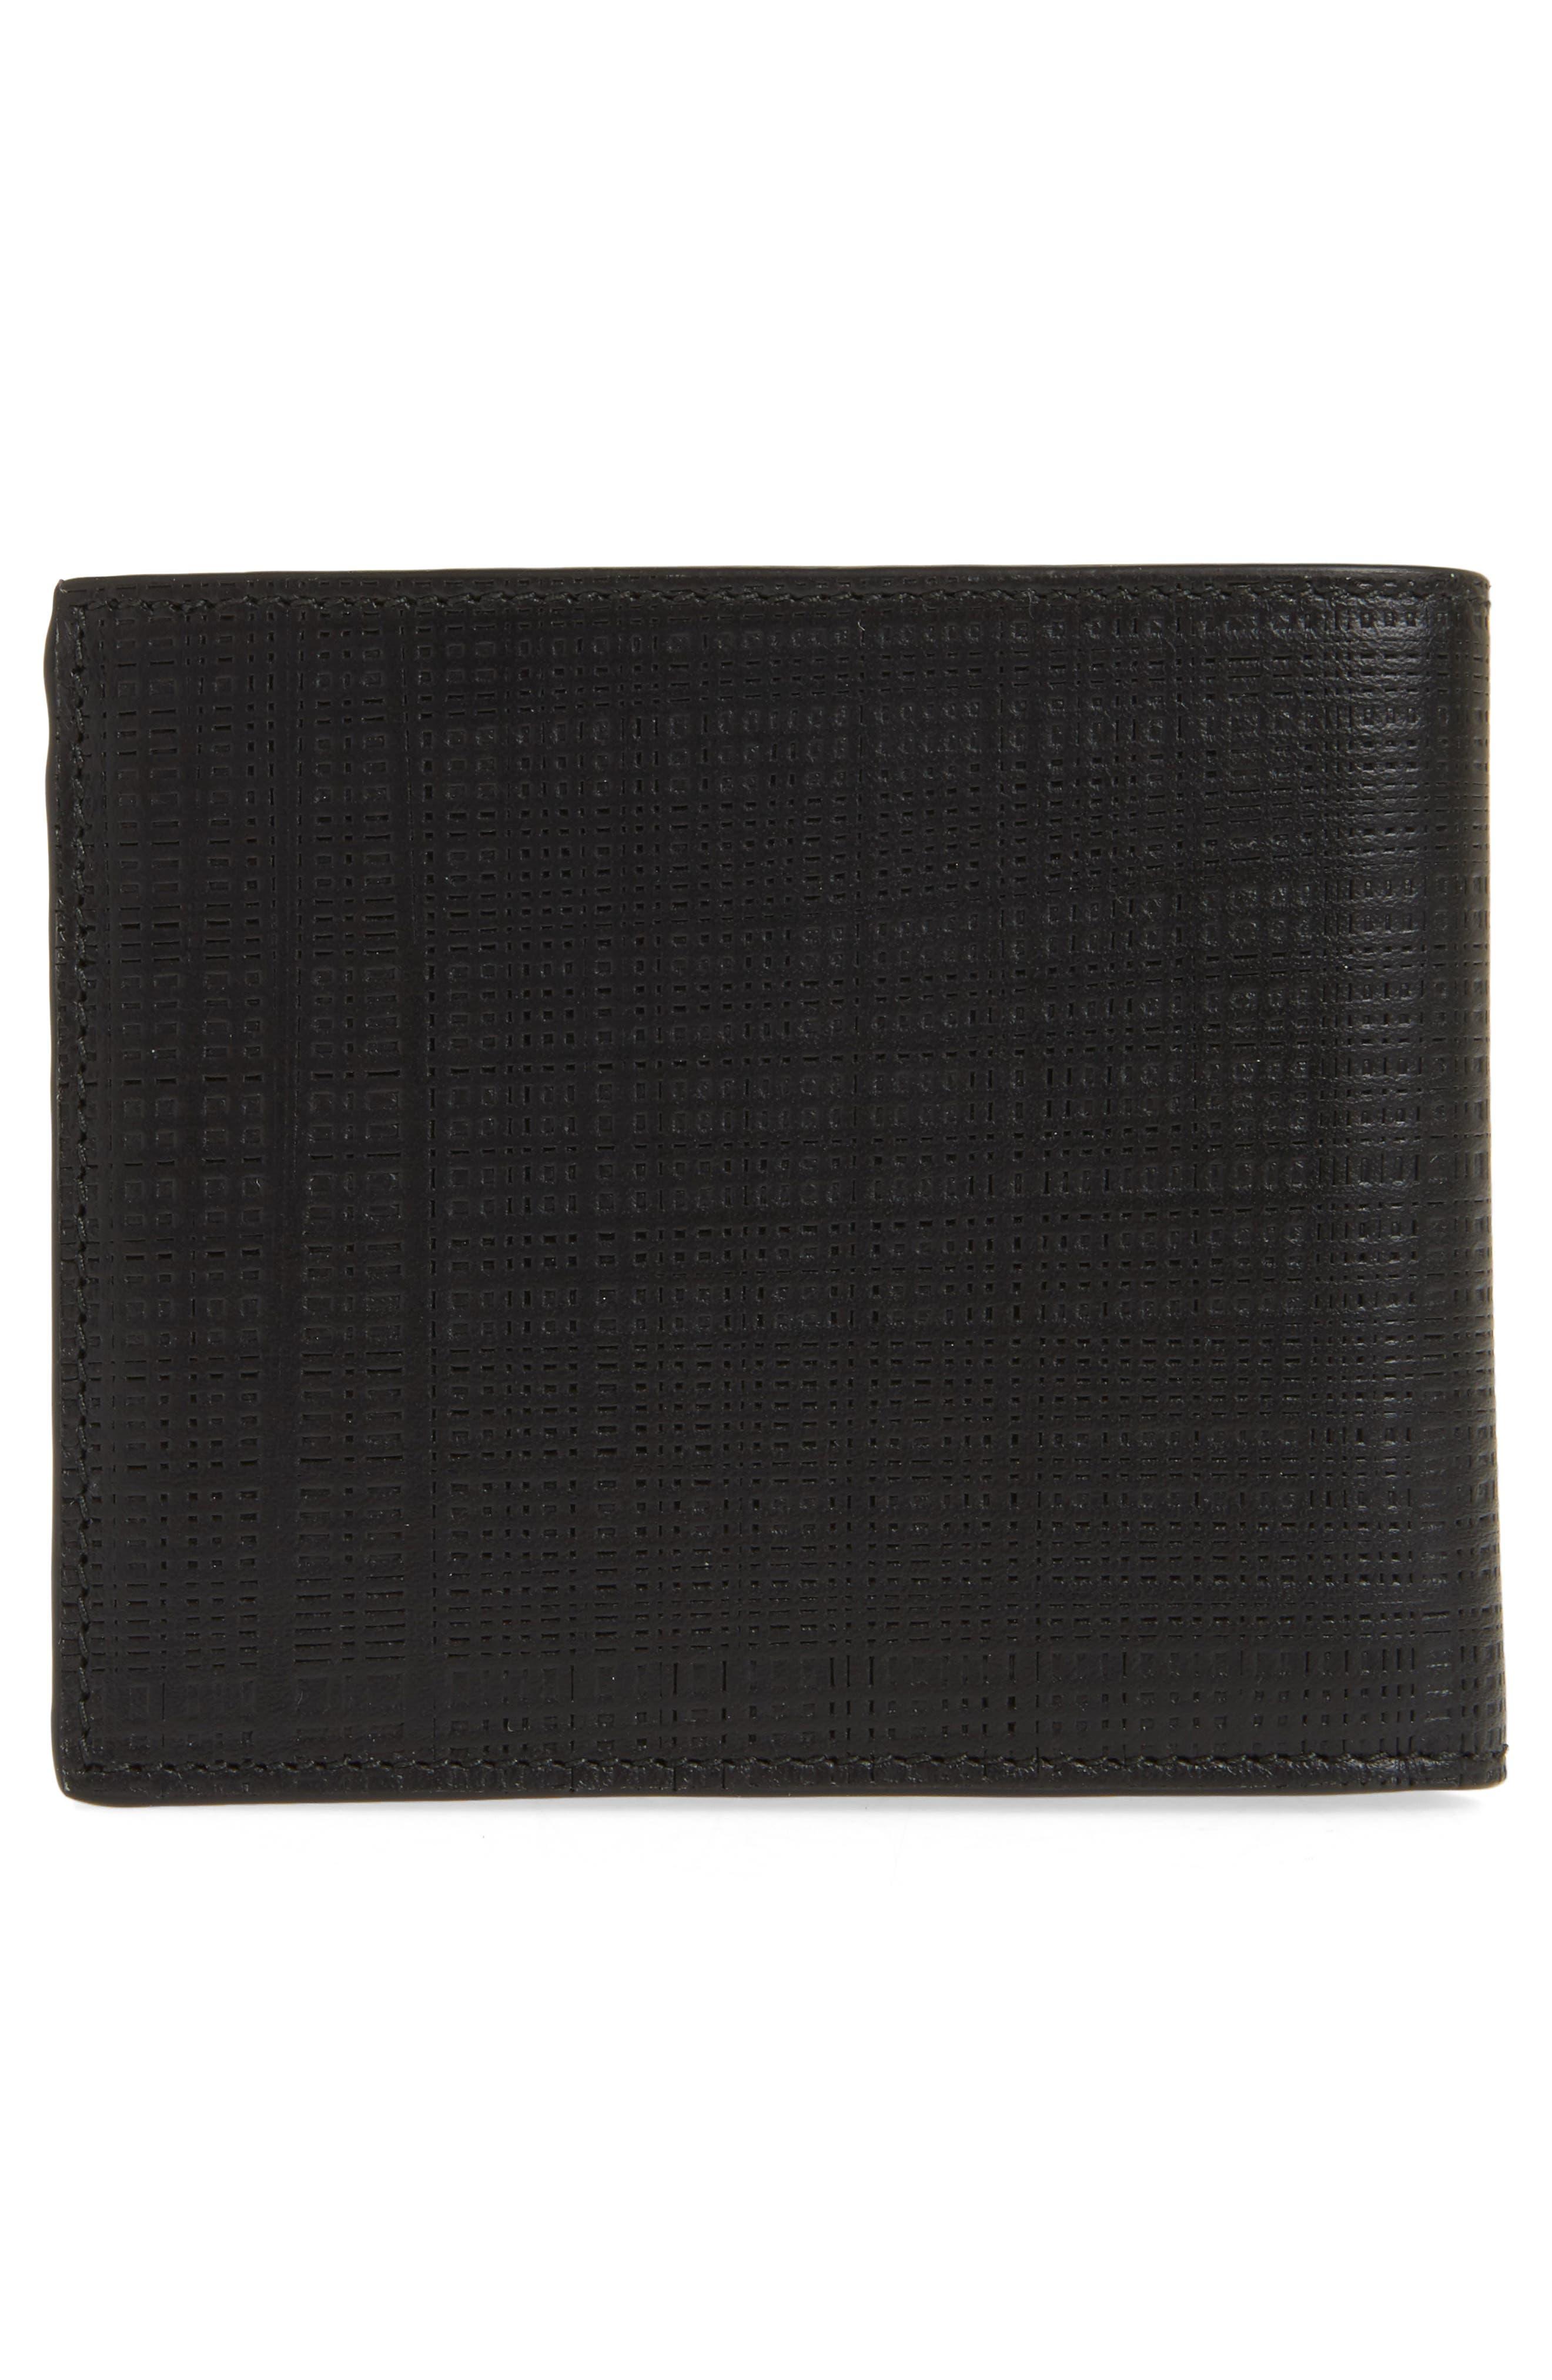 LOEWE, Bifold Leather Wallet, Alternate thumbnail 3, color, BLACK